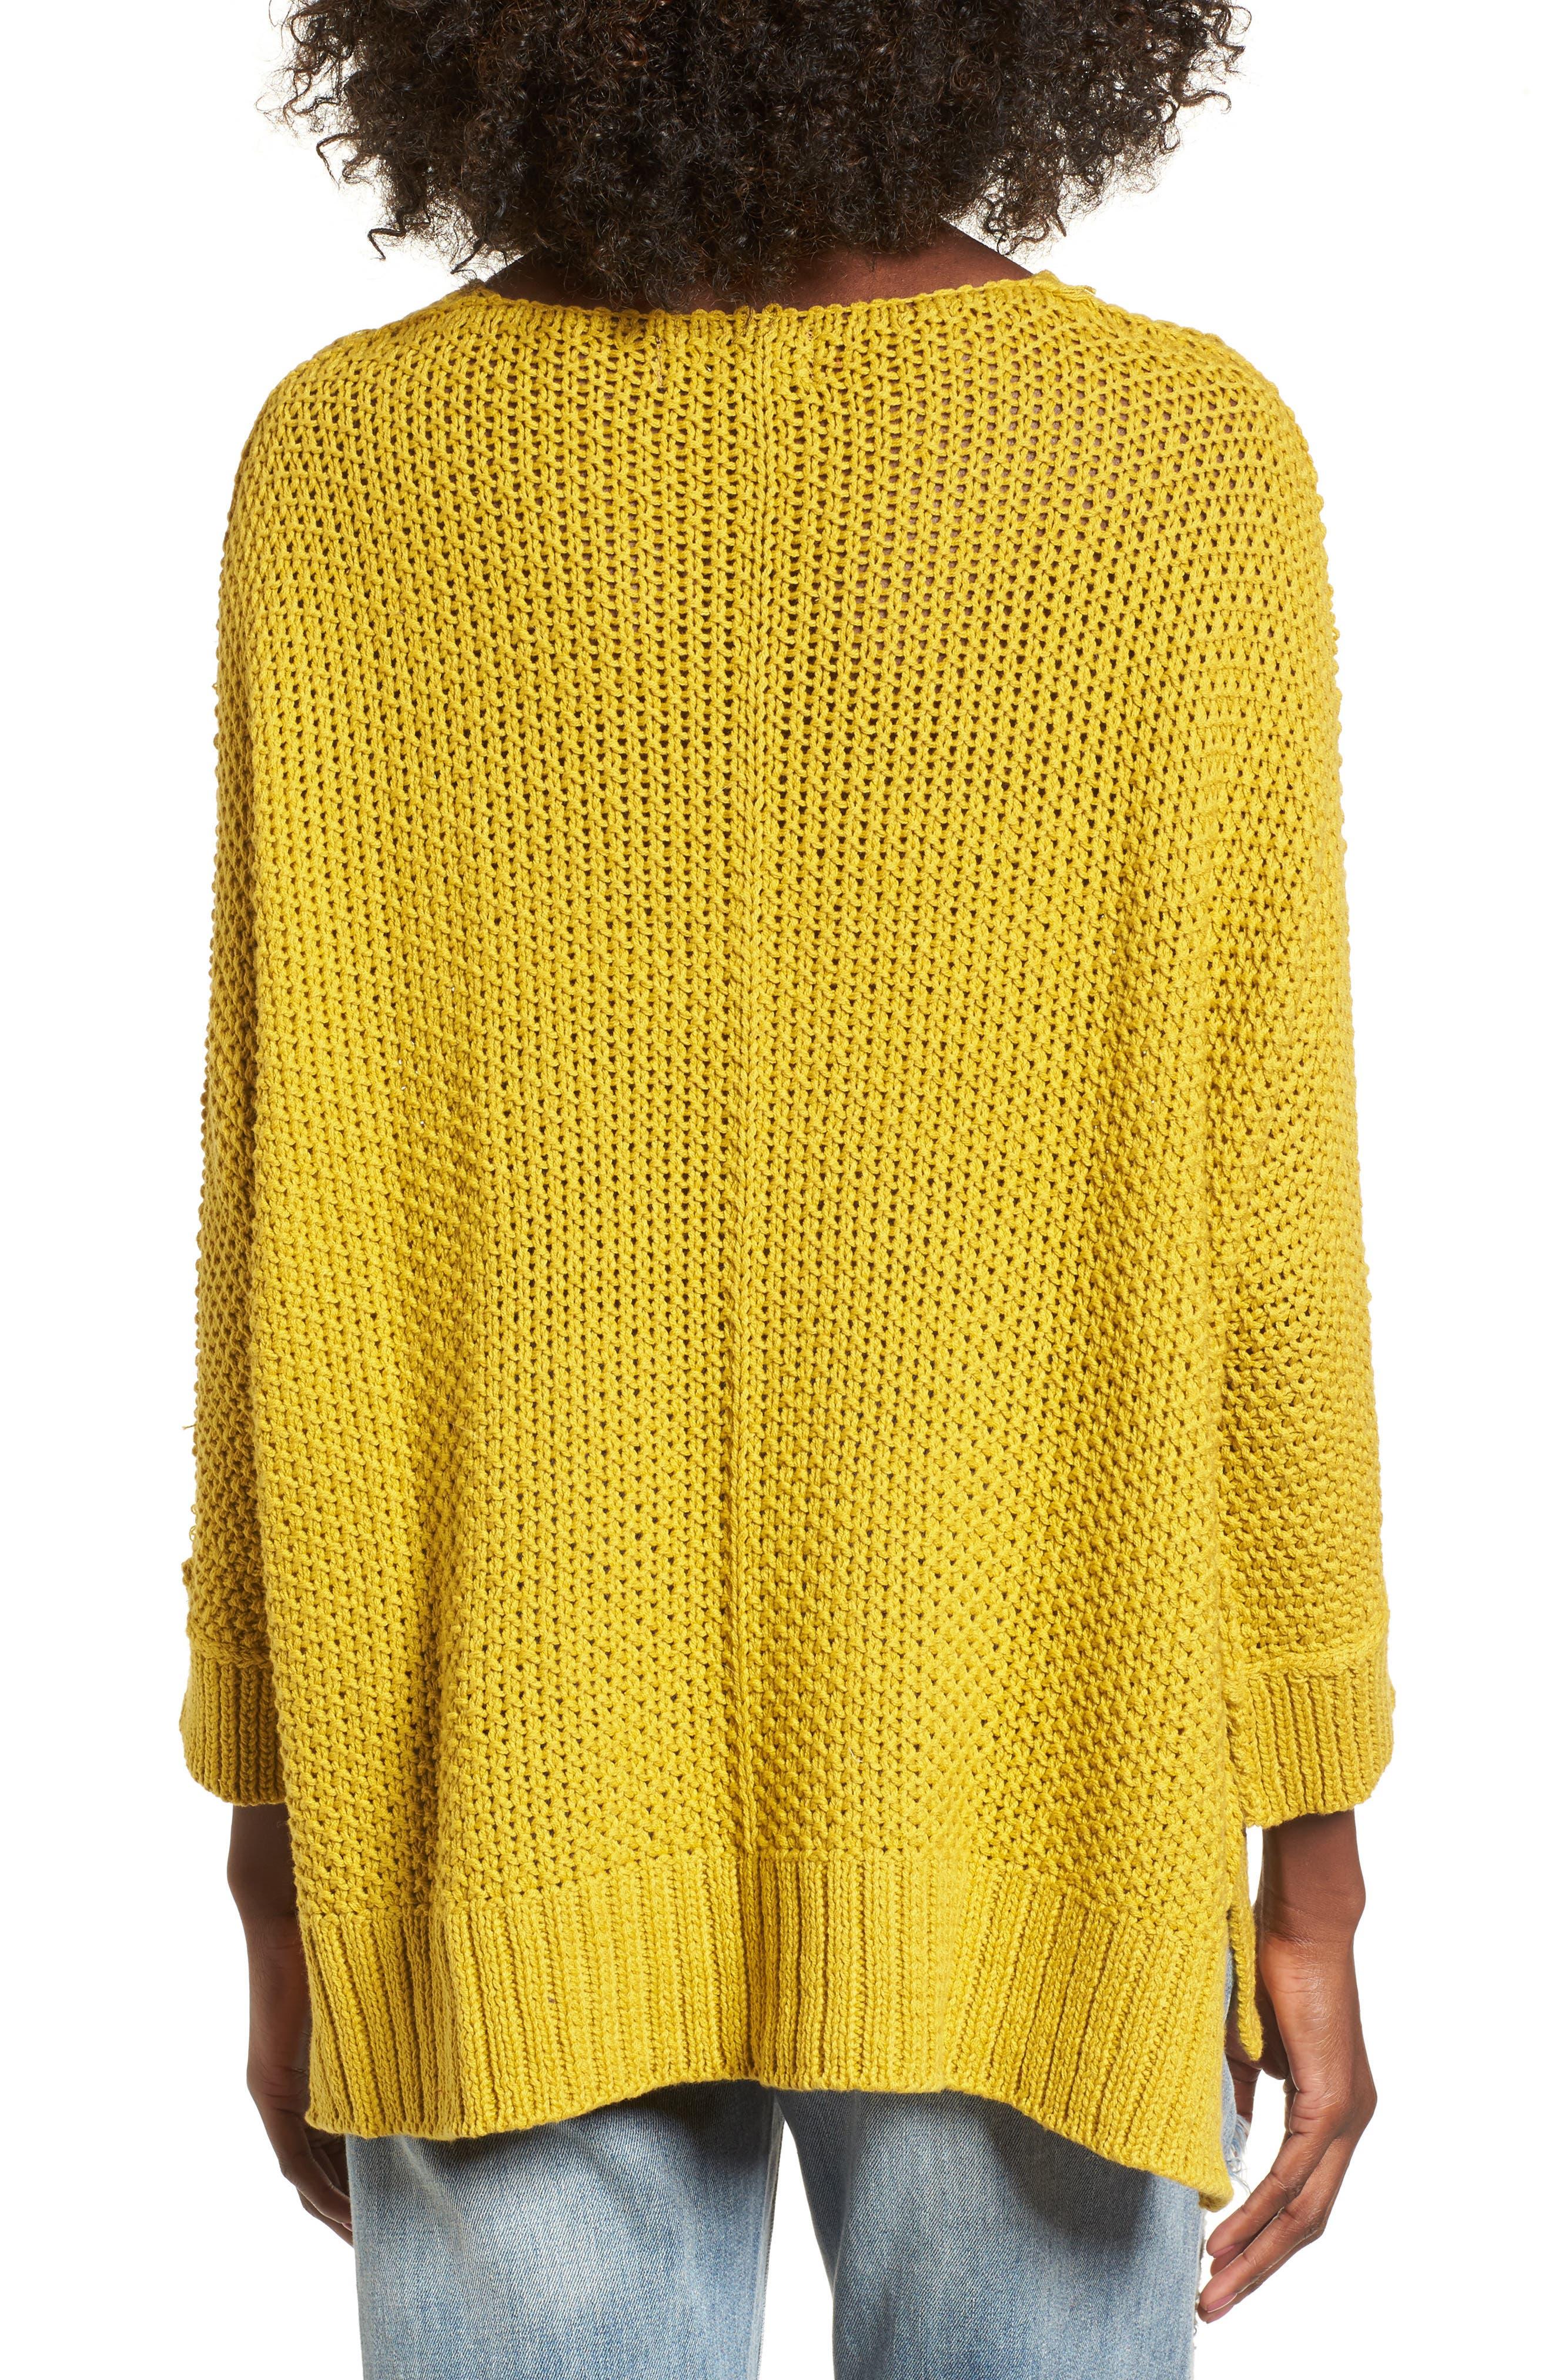 Dolman Sleeve Sweater,                             Alternate thumbnail 2, color,                             310